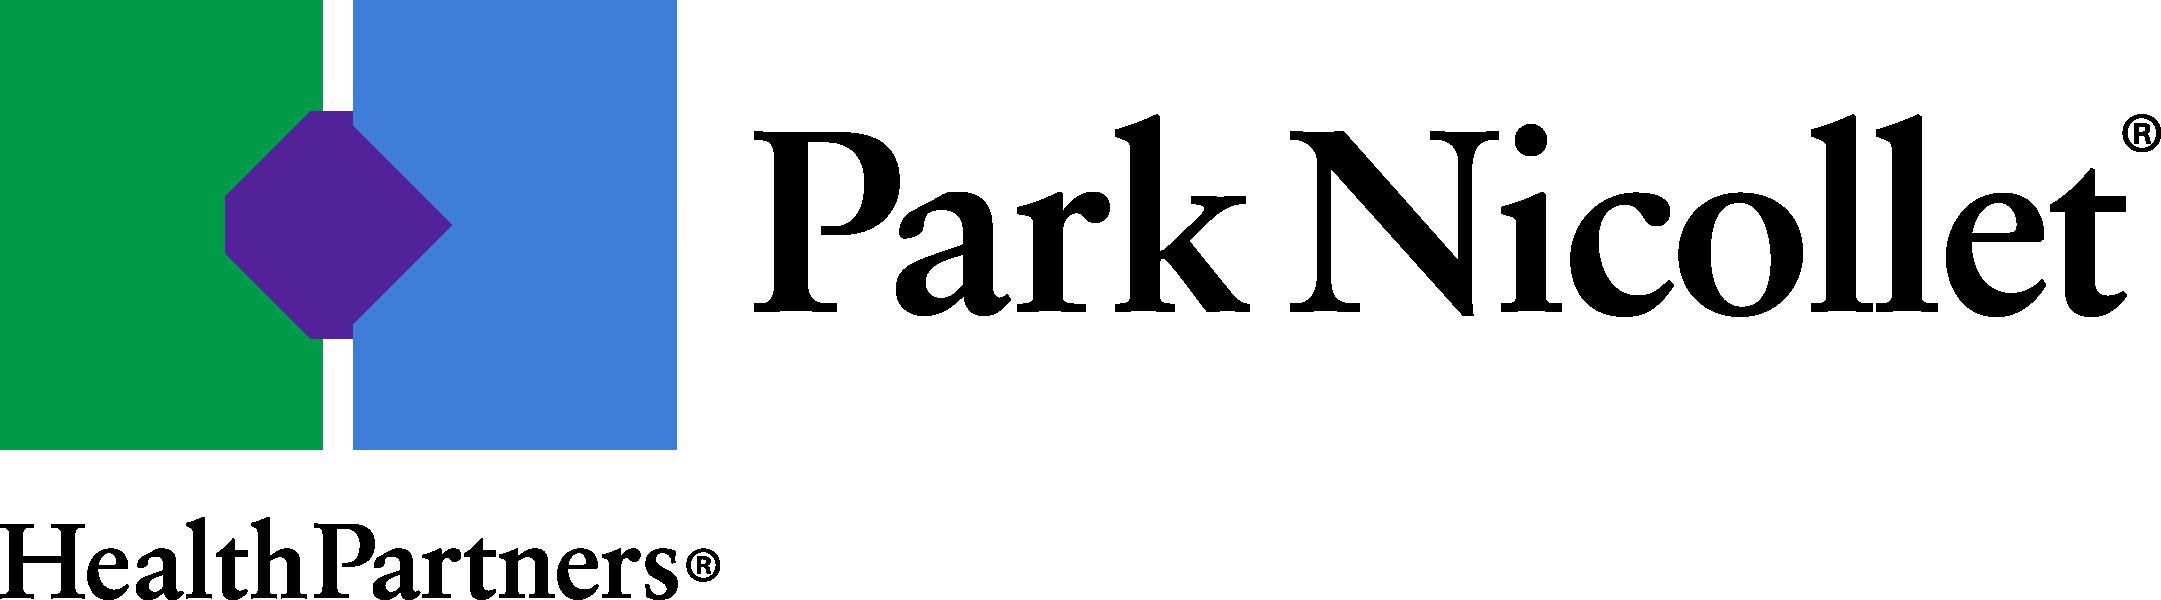 Park Nicollet logo